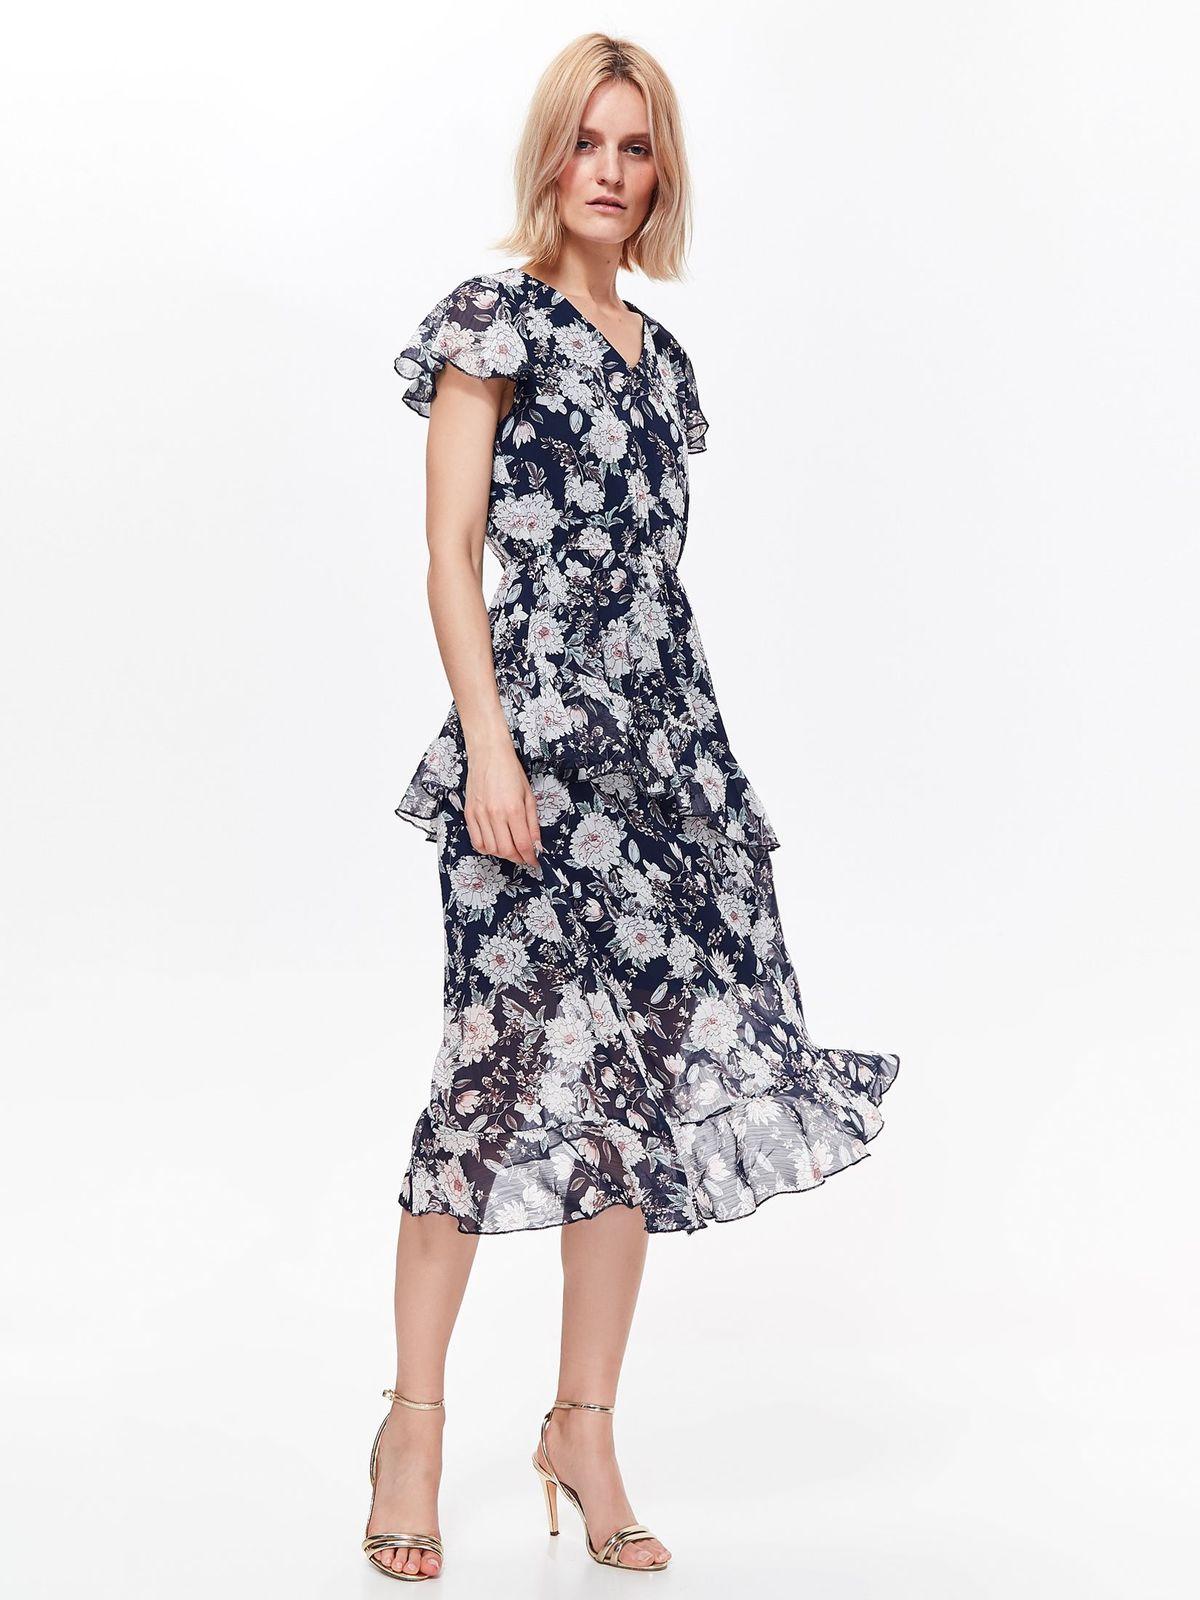 TOP SECRET top secret midi φλοραλ φορεμα 7bf90203d8a